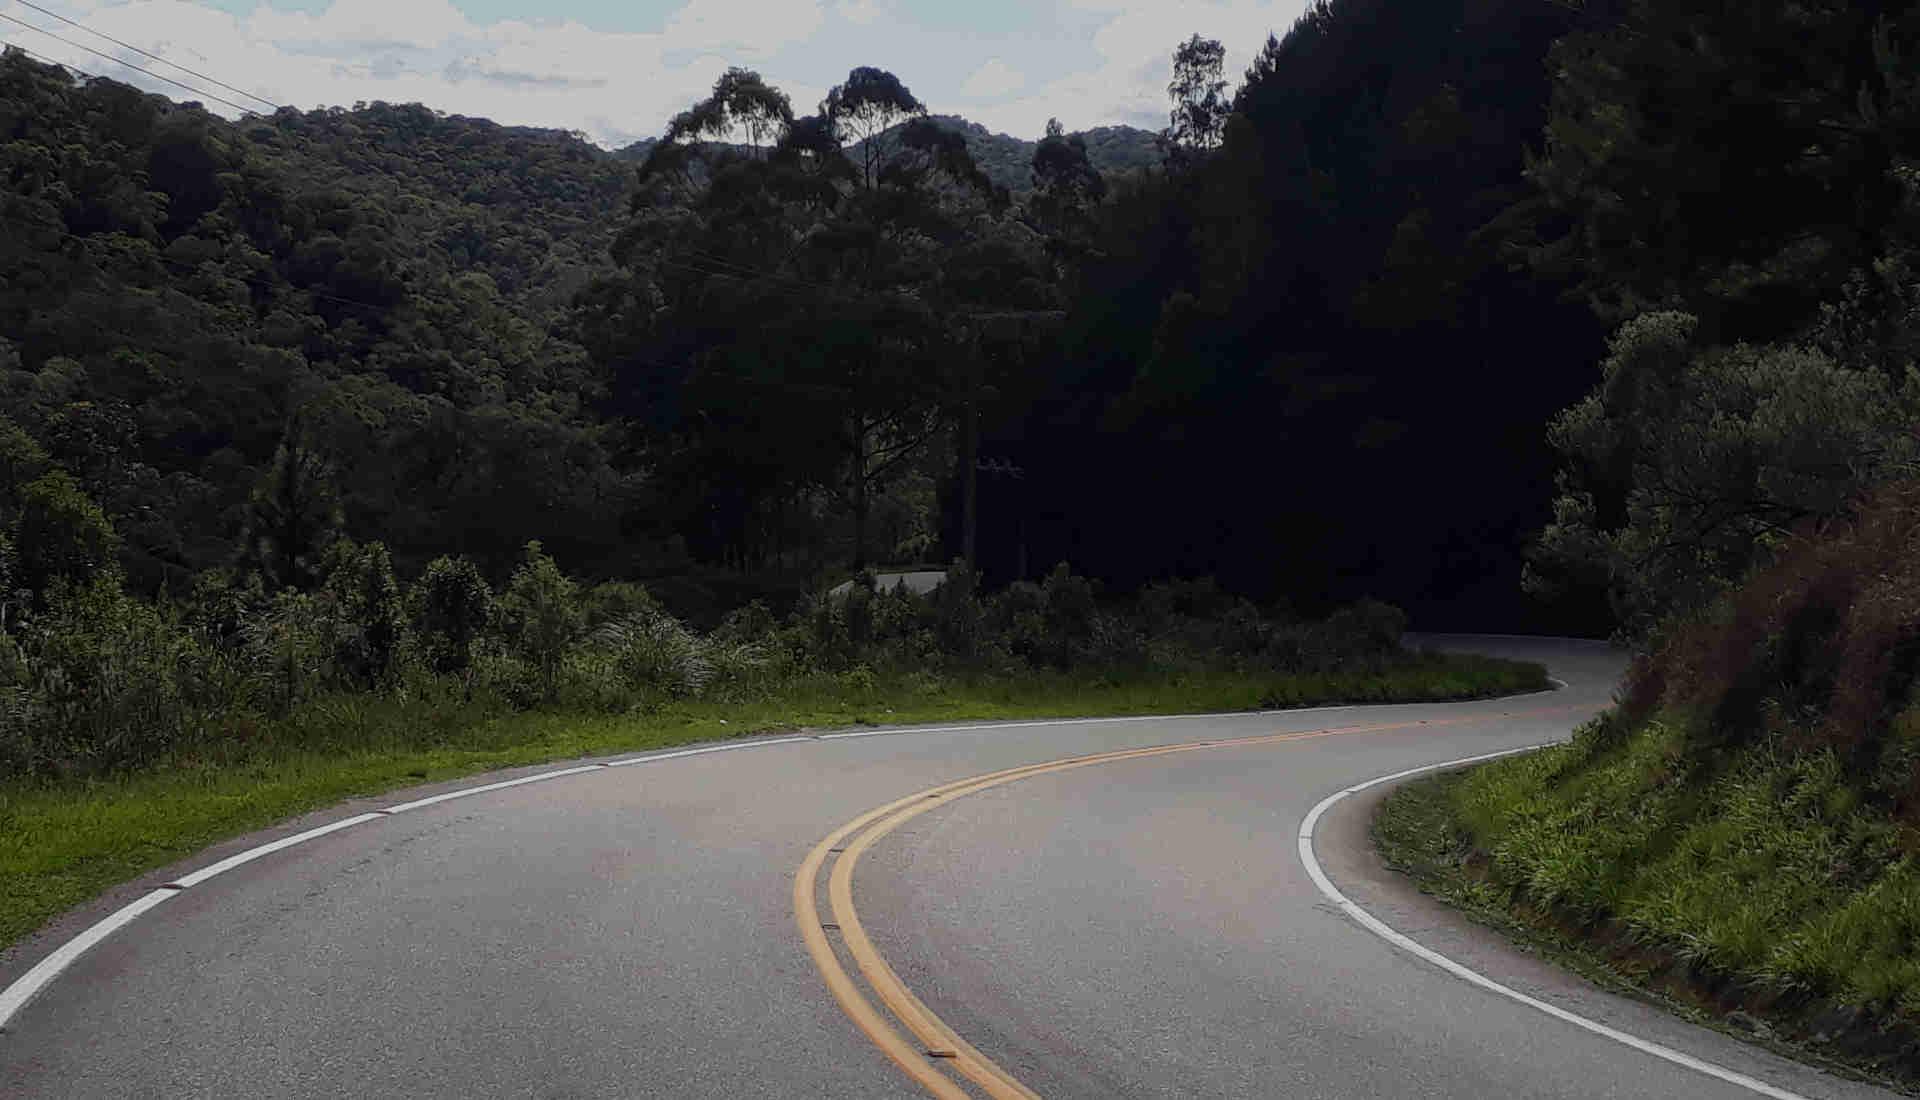 Super Randonnée Serrana – 600km 11200m altimetria